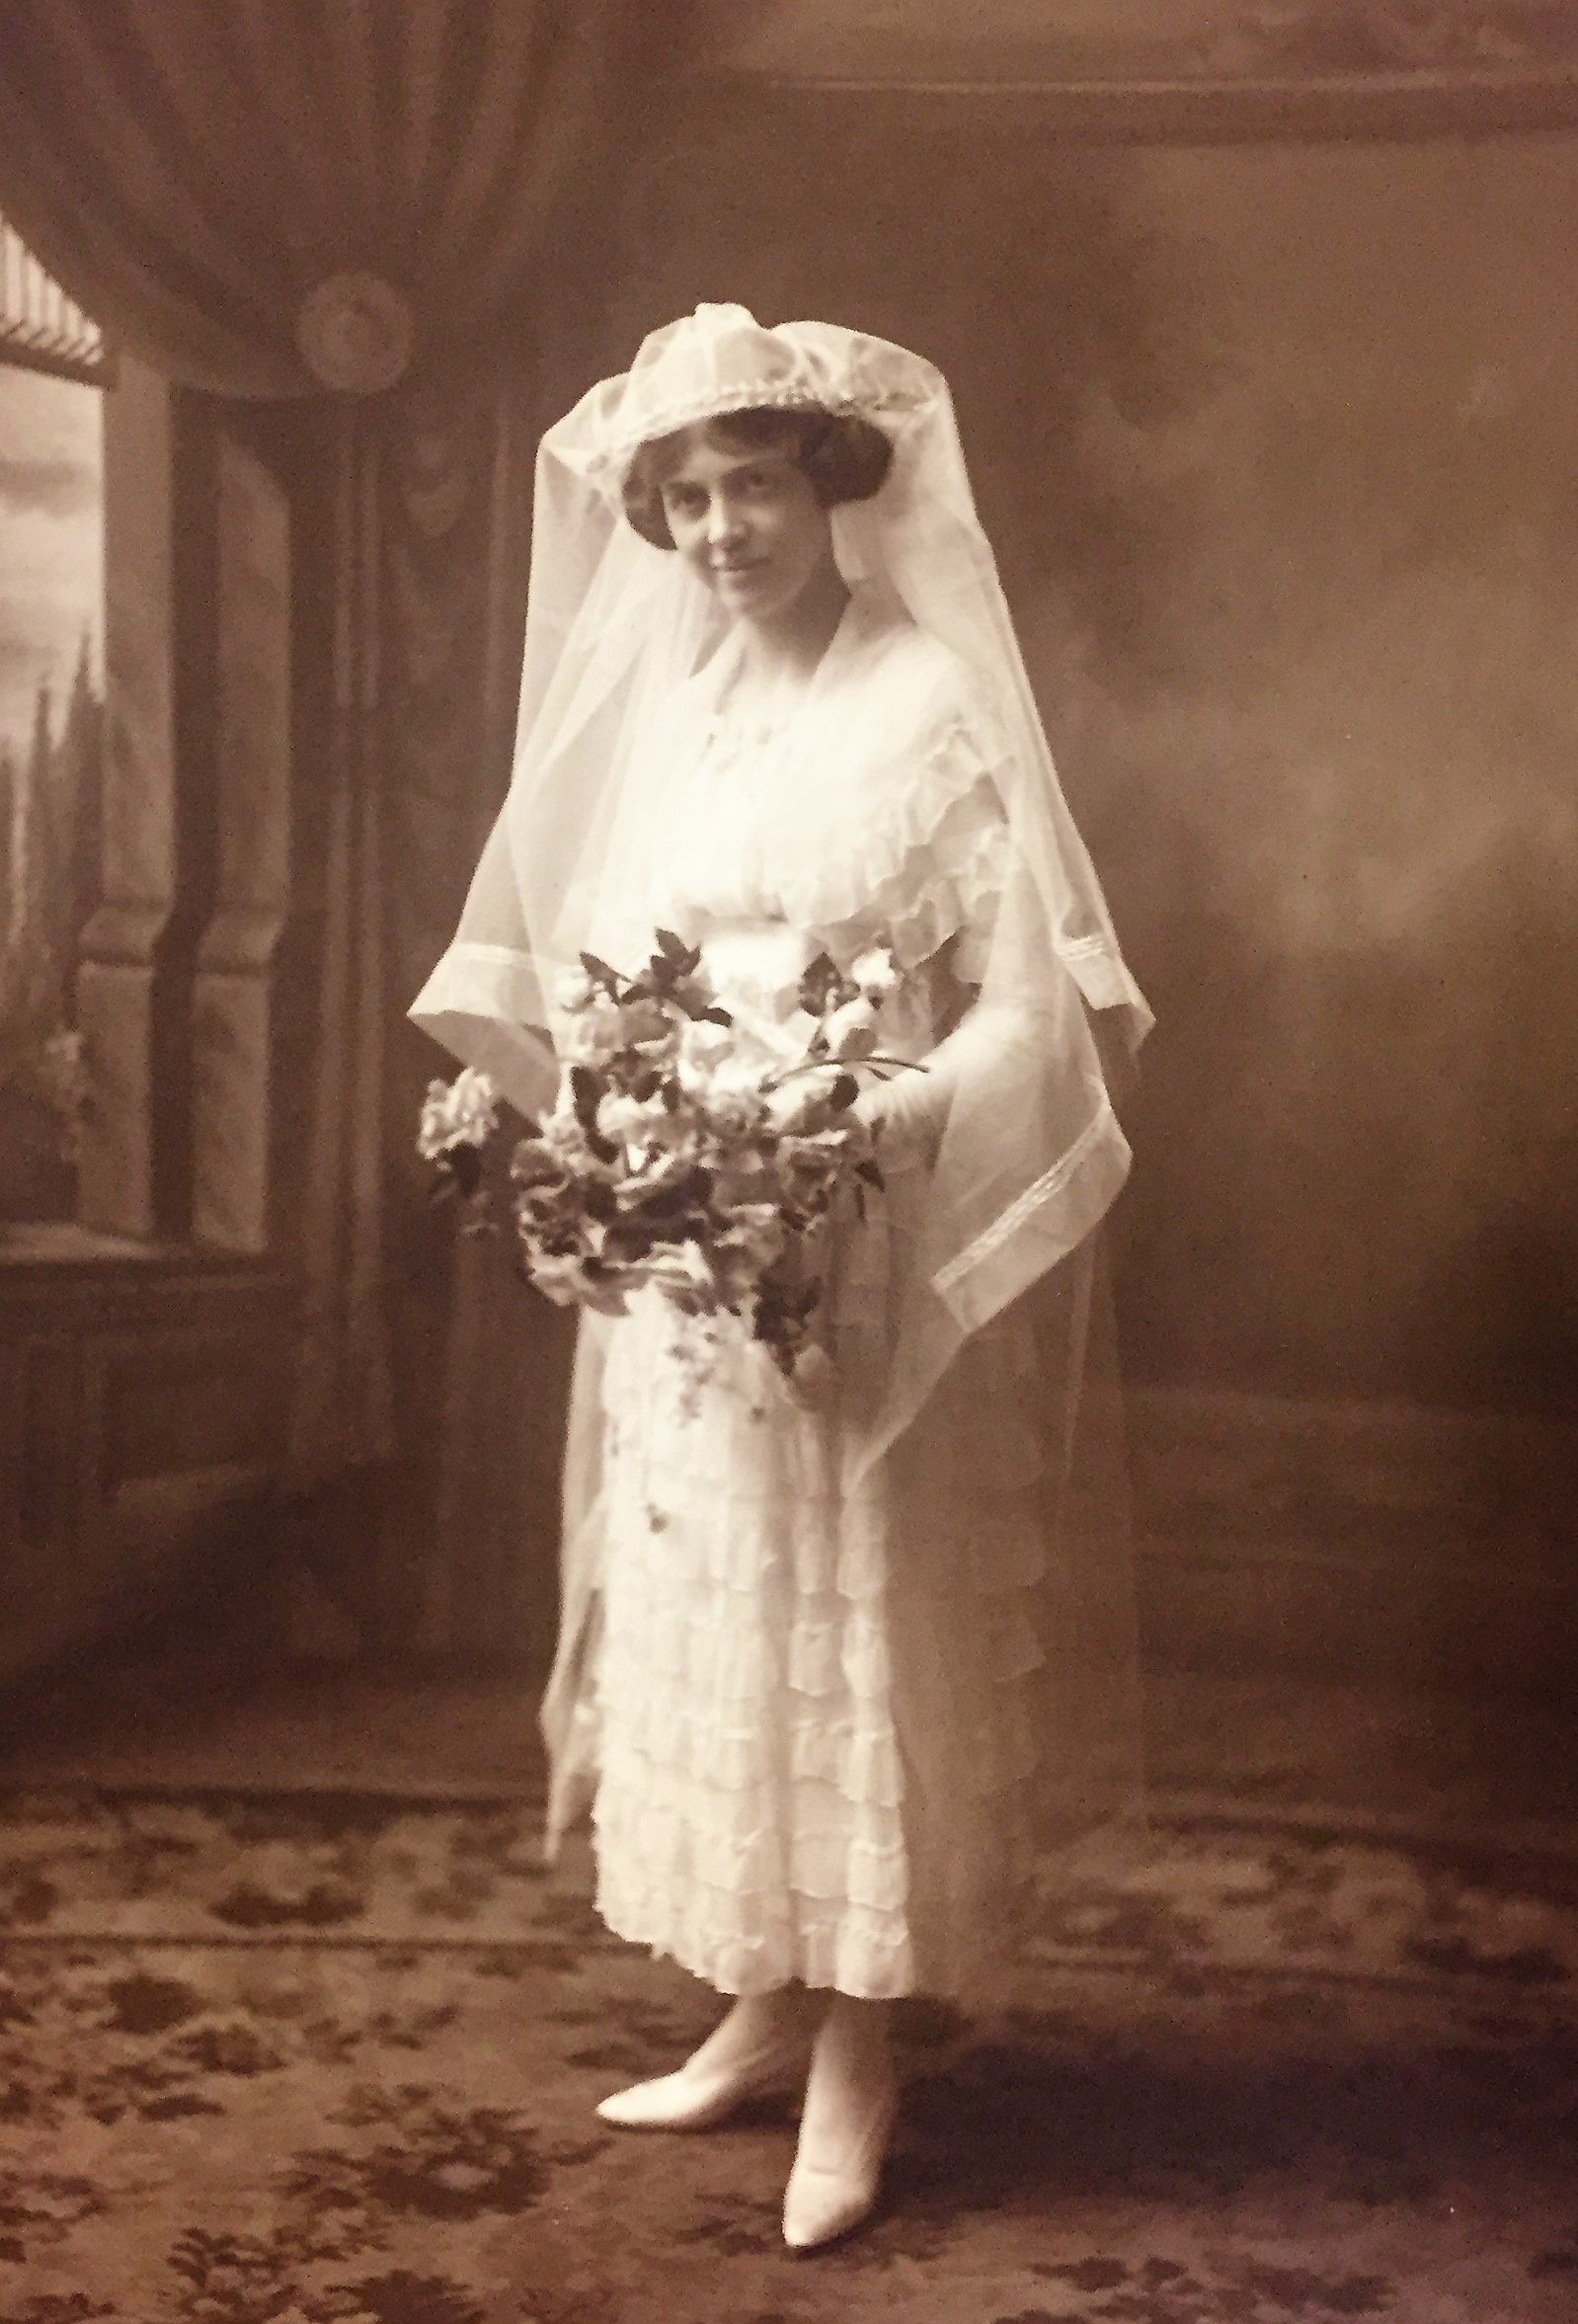 Helen Jones Roome, shown here on her wedding day in 1920. (Nova Scotia Archives)